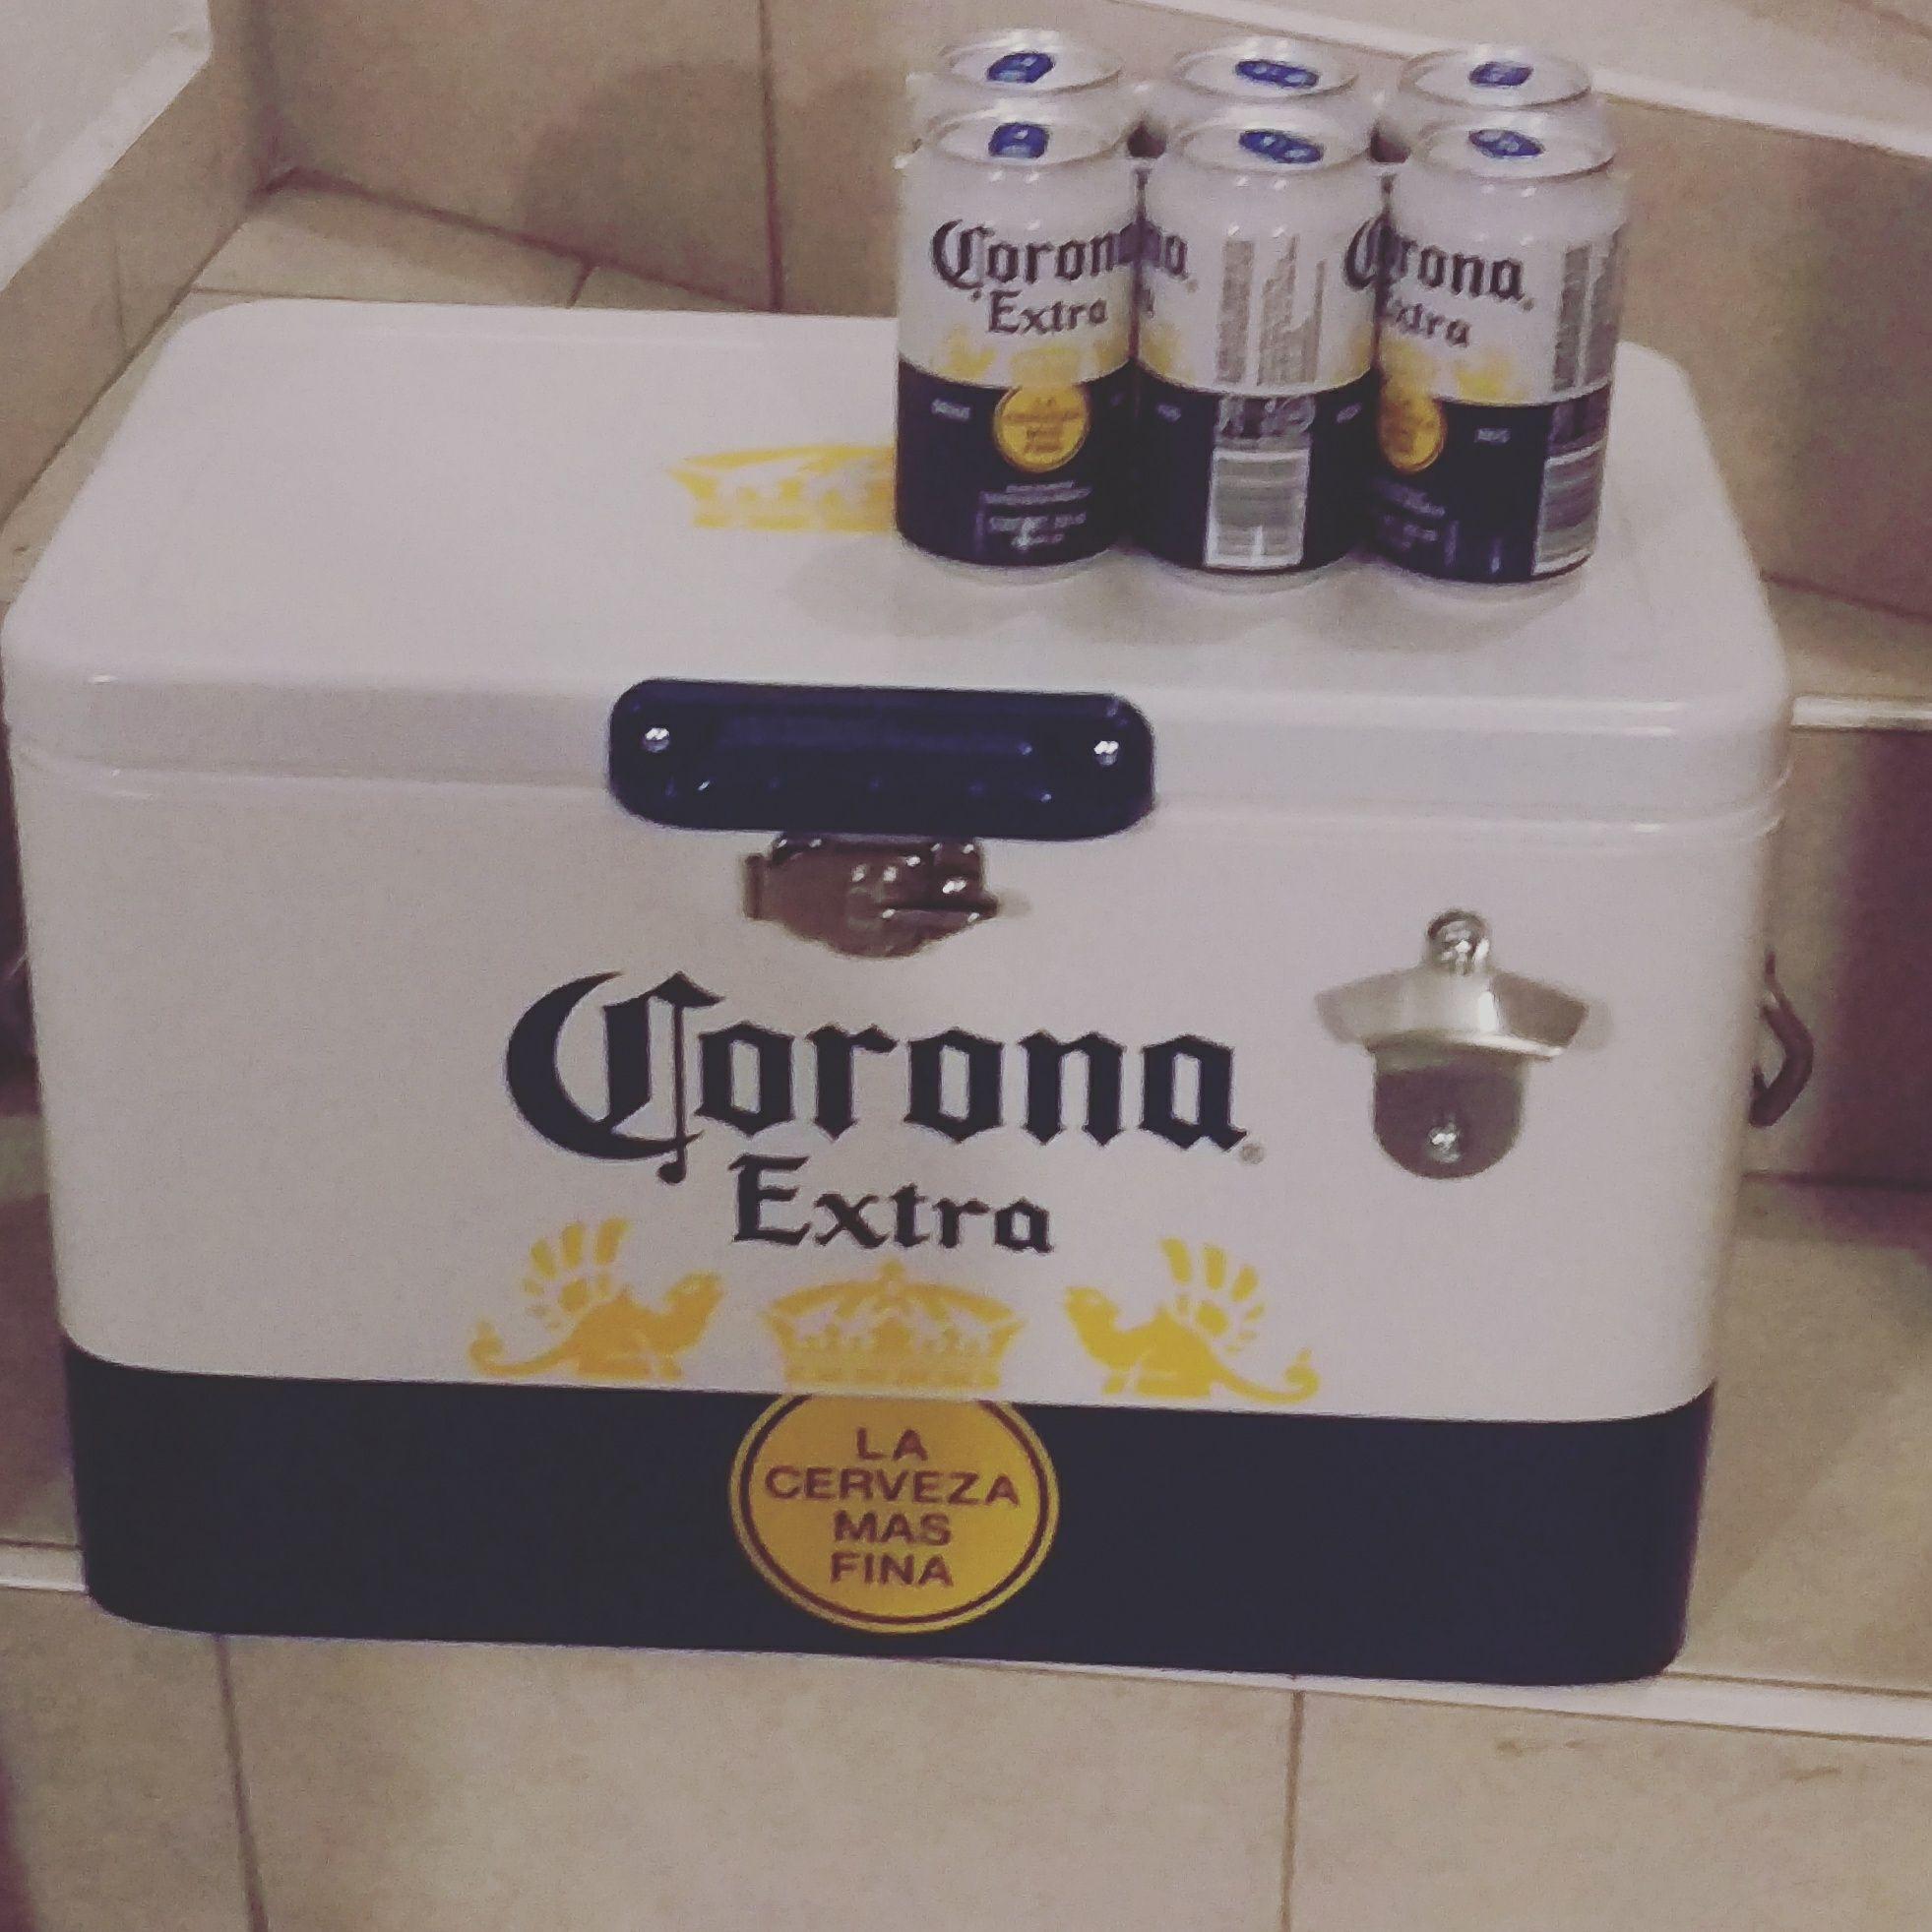 Walmart: Cooler Corona Hielera y 4 sixpack de cerveza corona